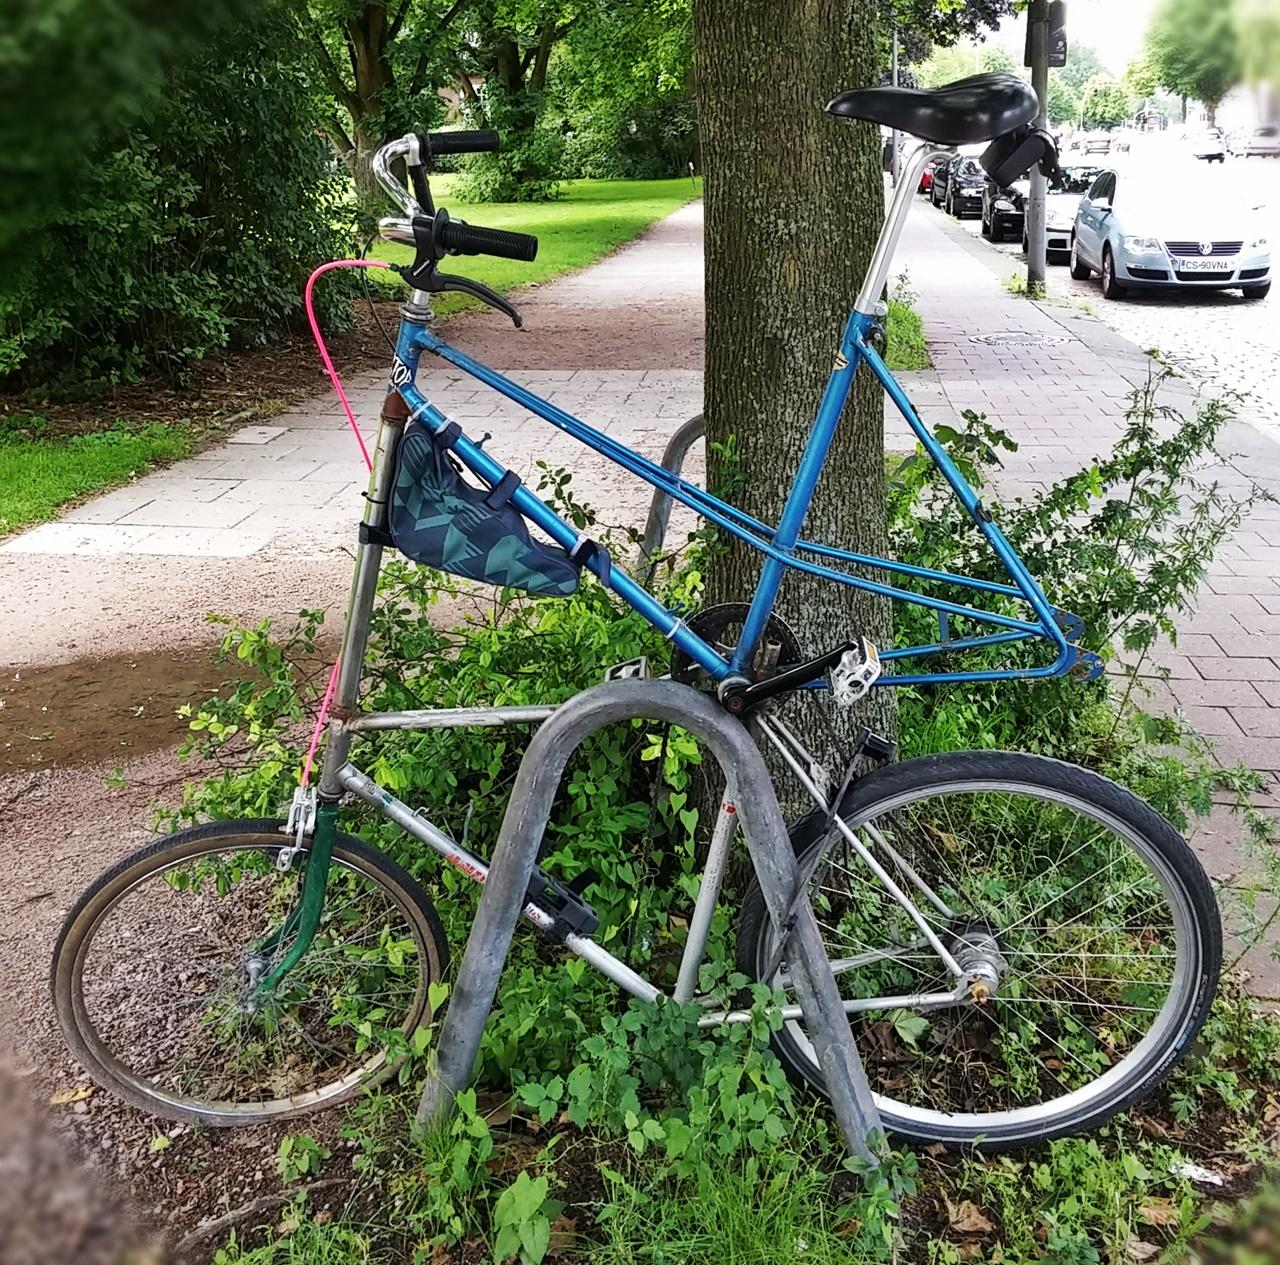 Tallbike mit interessanter Rahmenkombination